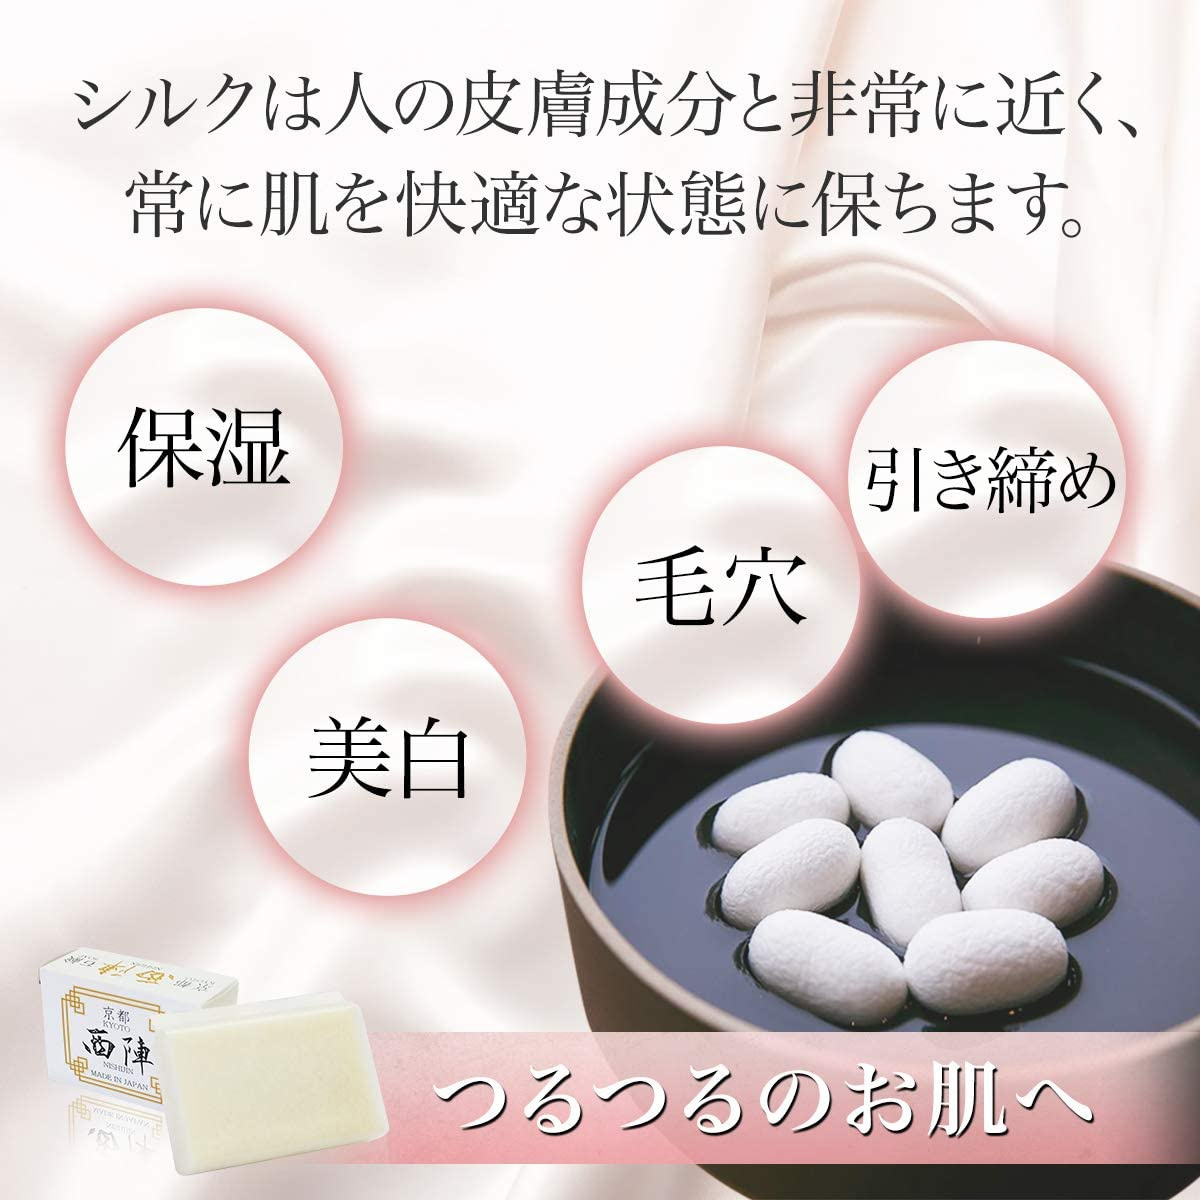 西陣石鹸(NISHIJIN SOAP) 洗顔用石鹸の商品画像7